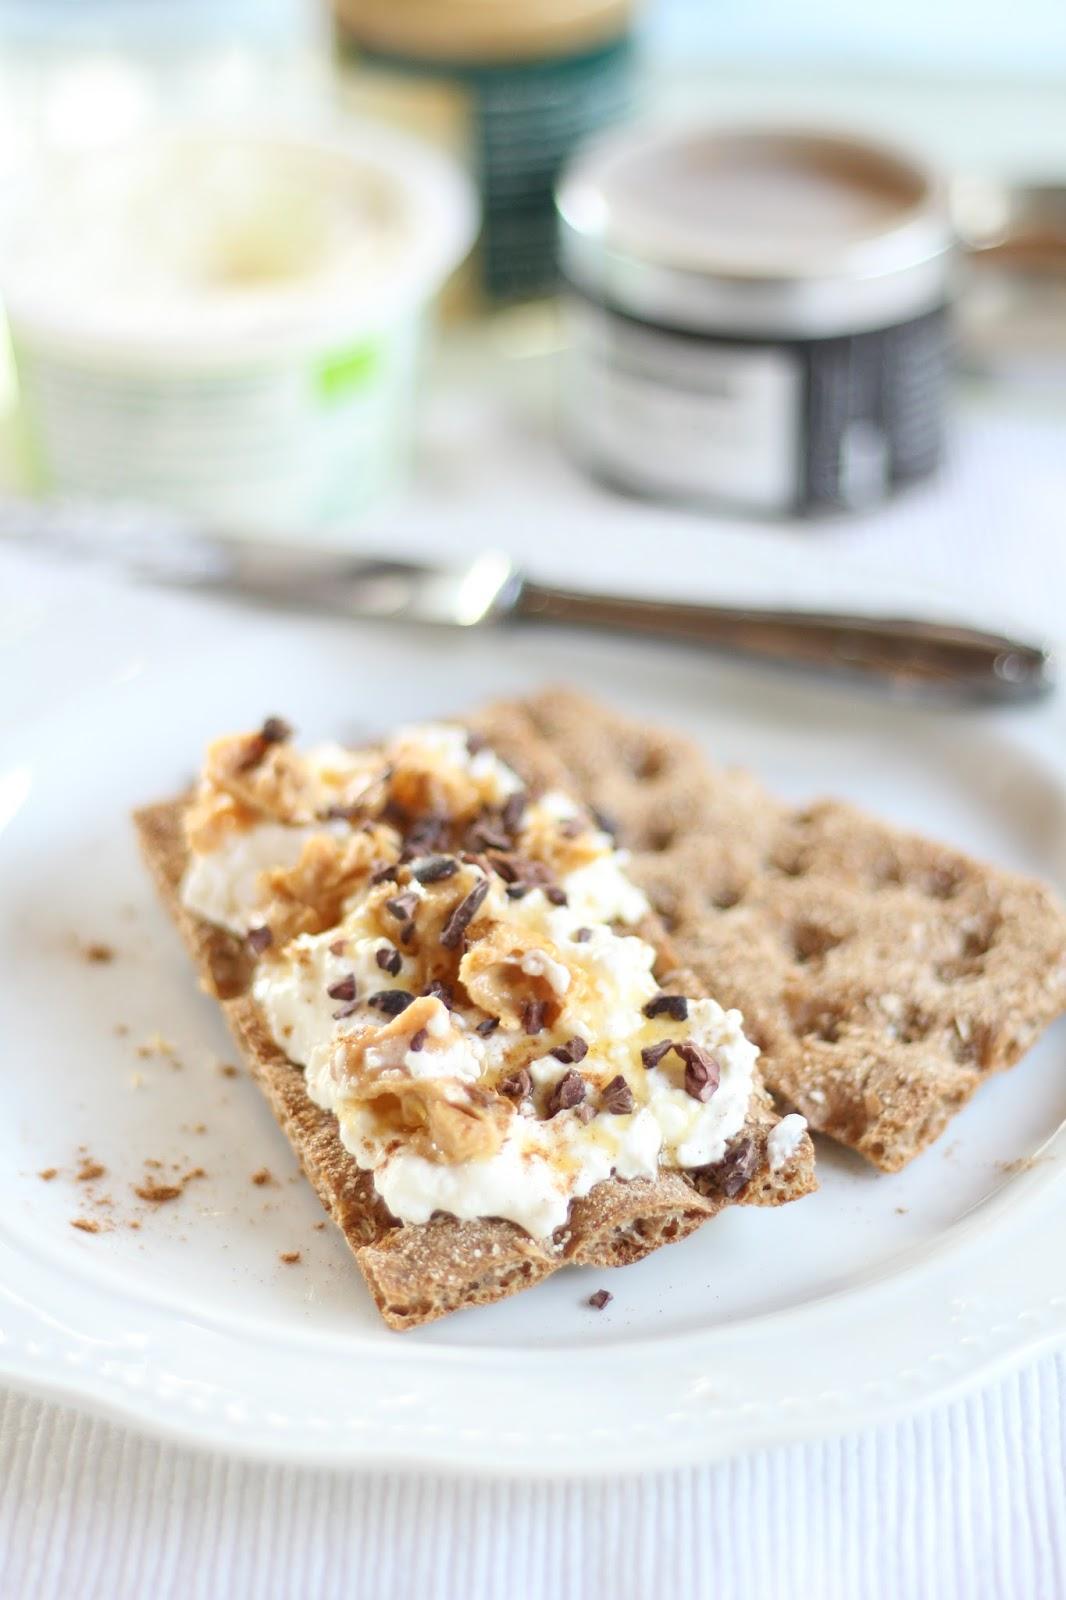 Vollkorn-Knäckebrot mit Hüttenkäse, Erdnussbutter, Cocoa Nibs, Honig und Zimt